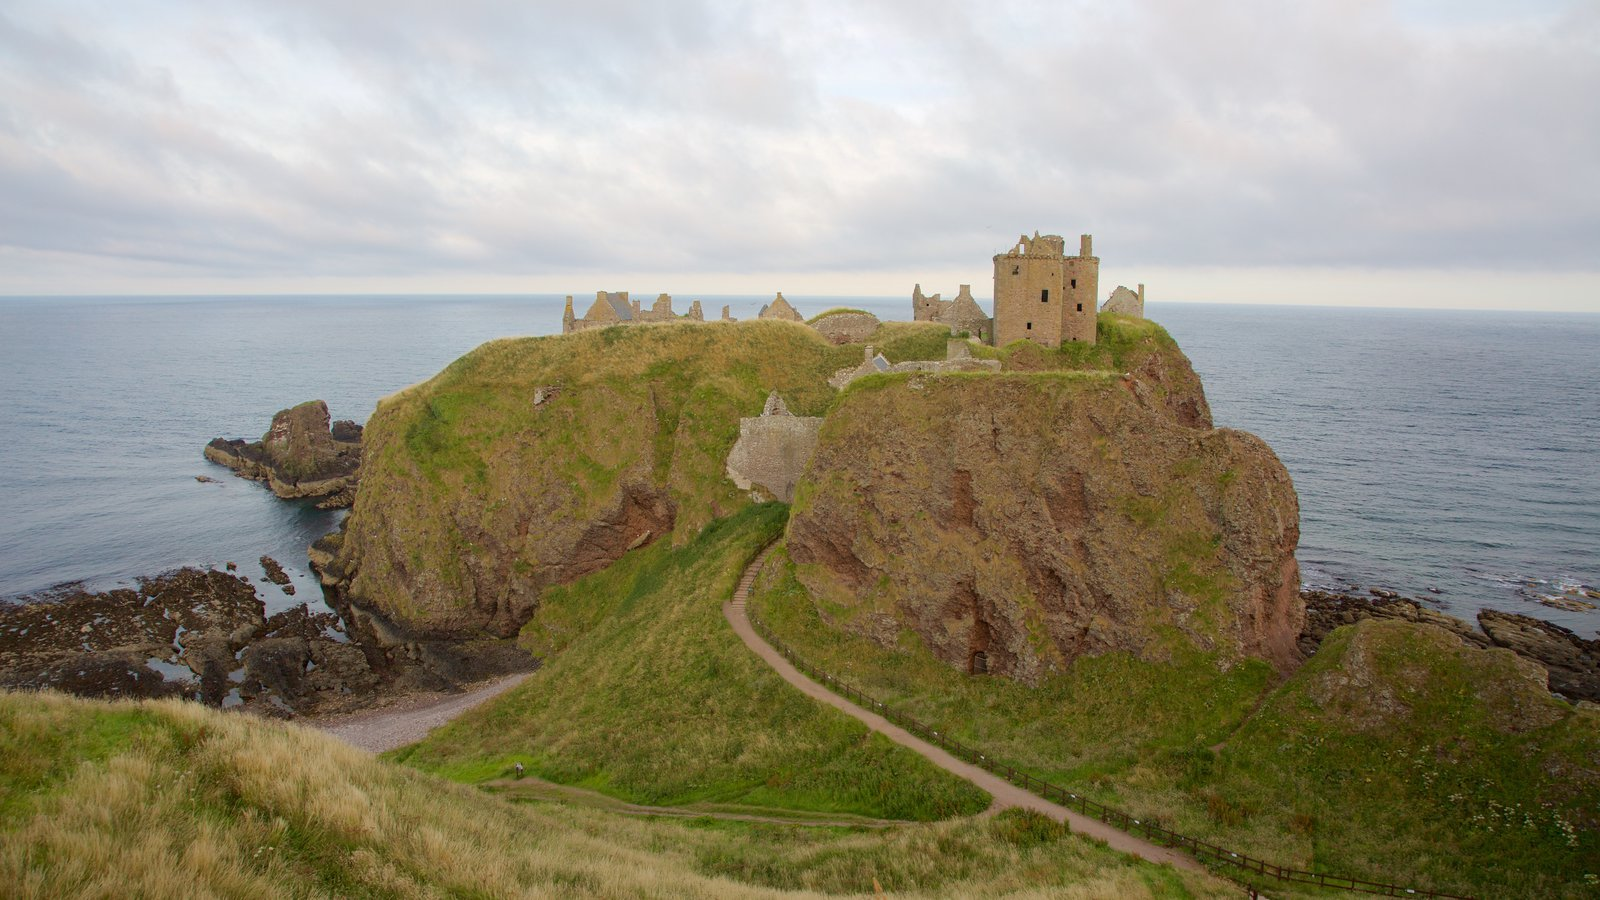 Dunnottar Castle showing a castle, general coastal views and farmland